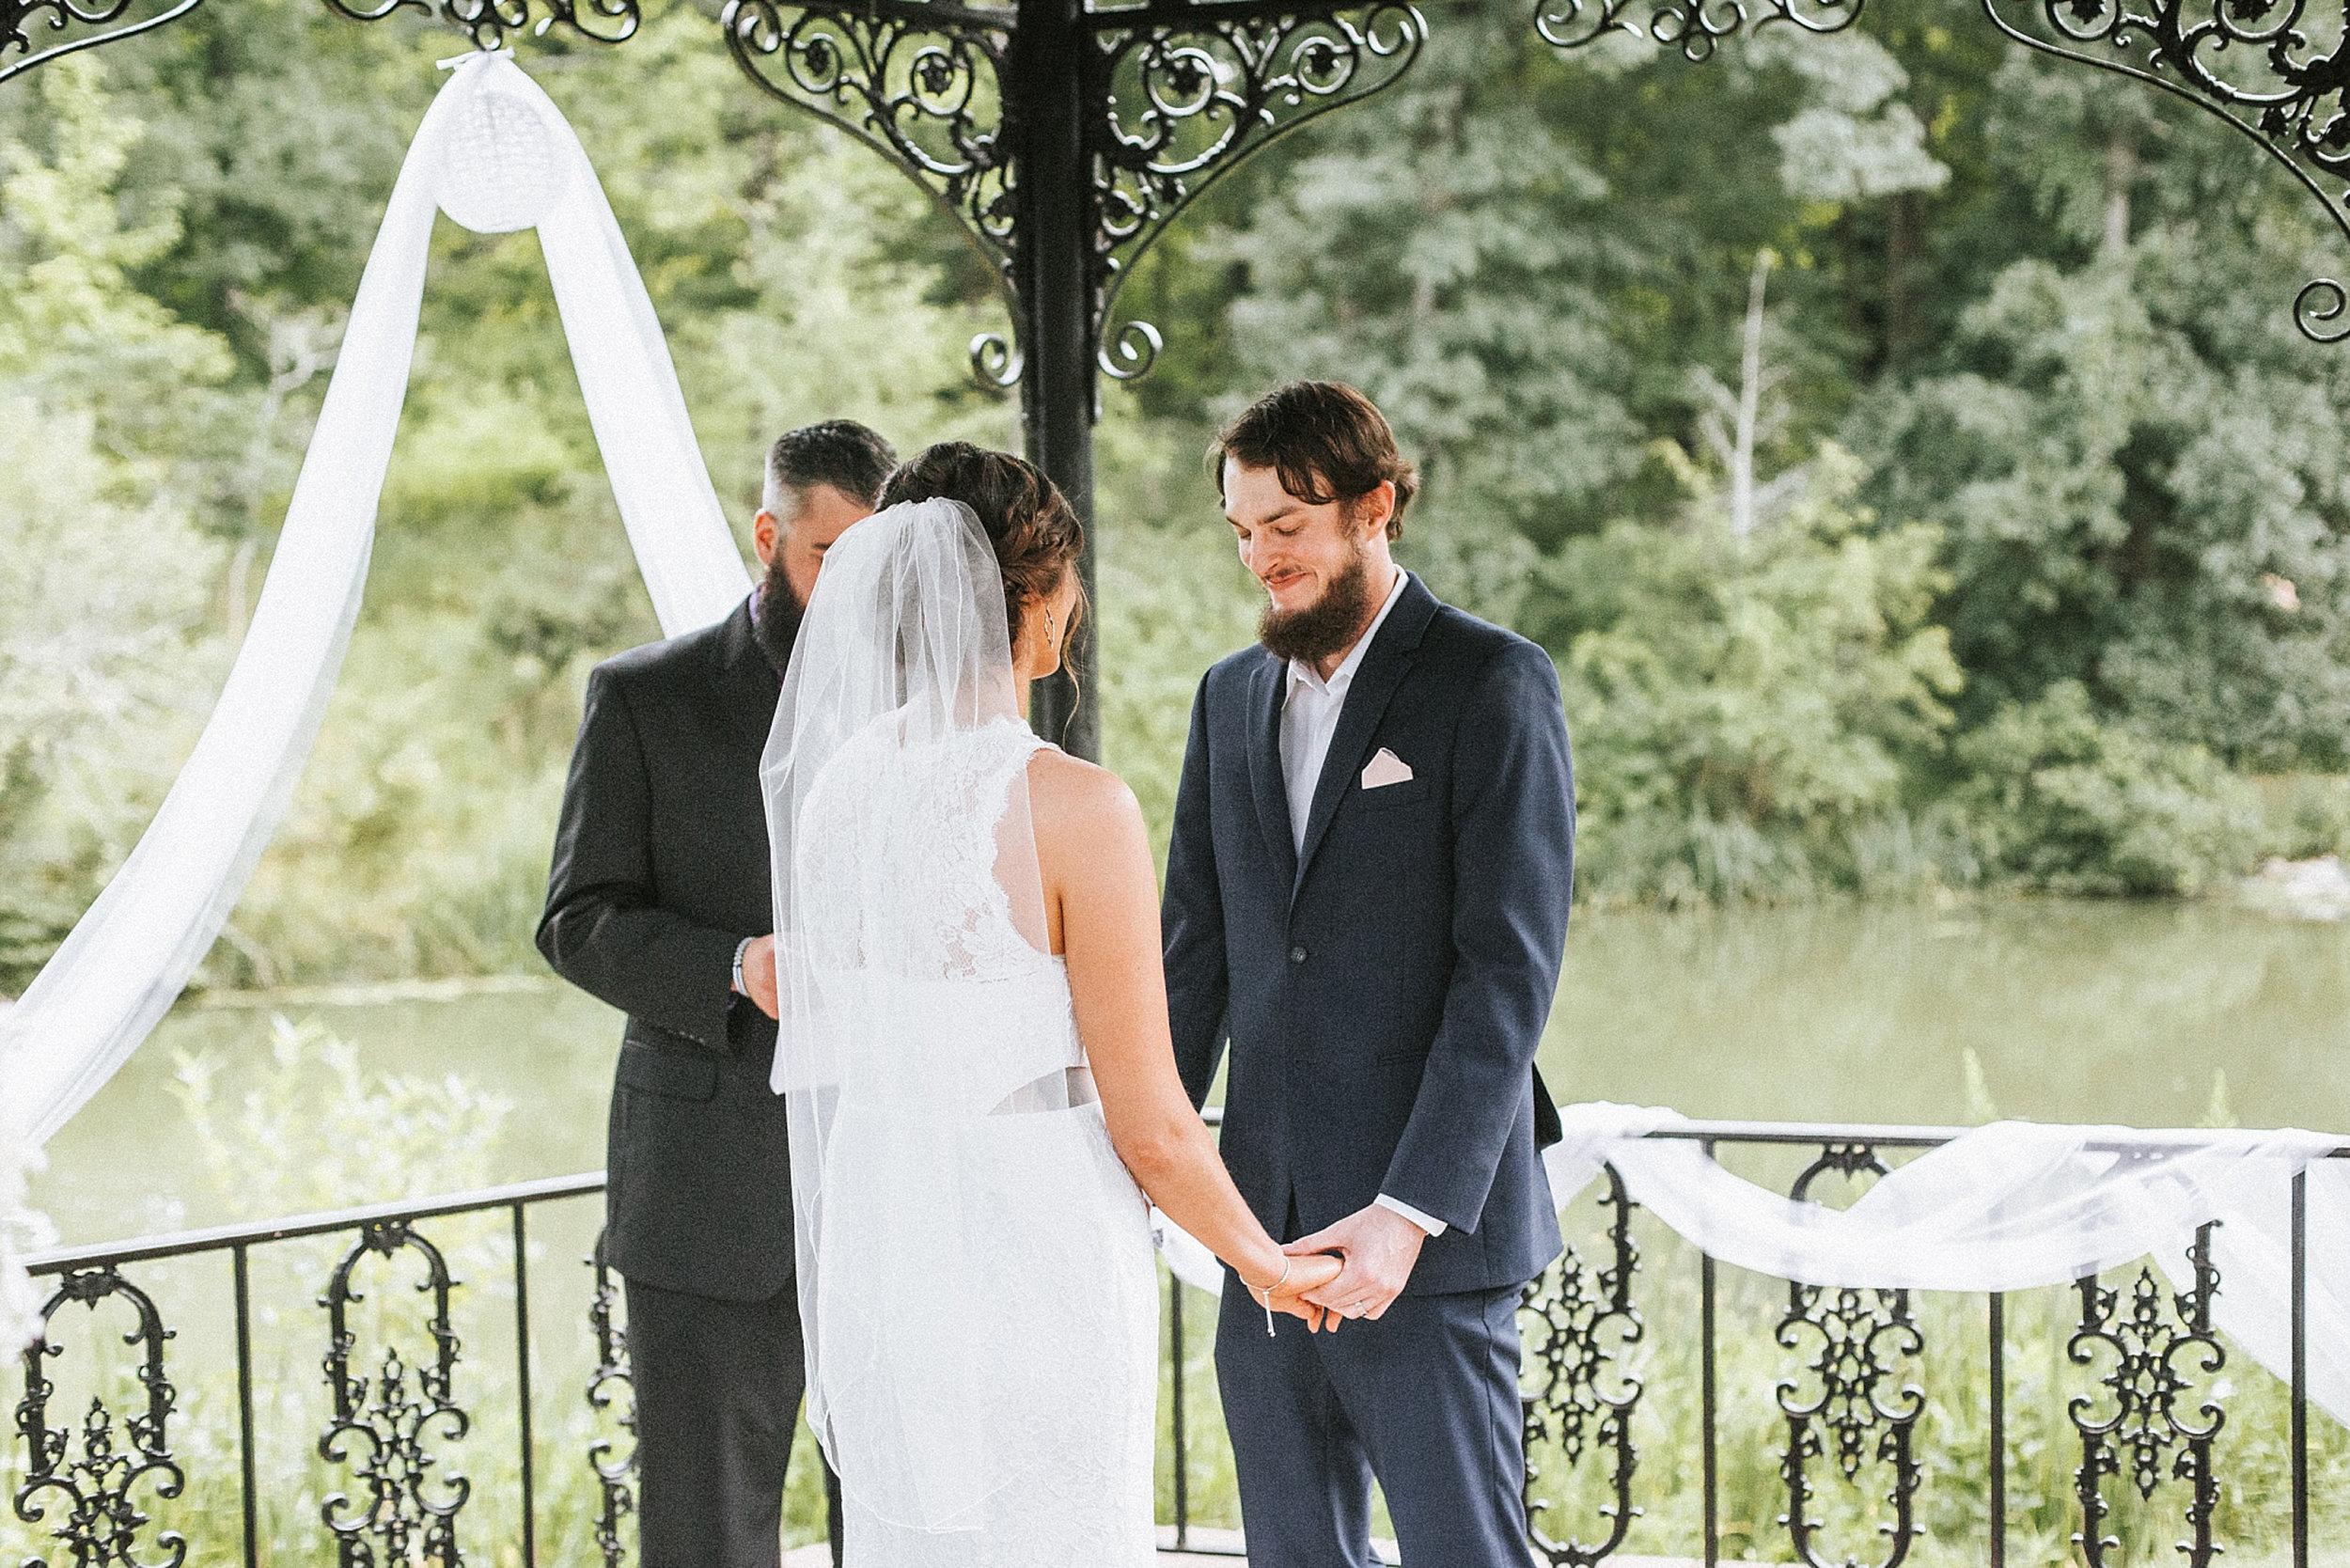 Brooke Townsend Photography - Ohio Wedding Photographer (63 of 78).jpg